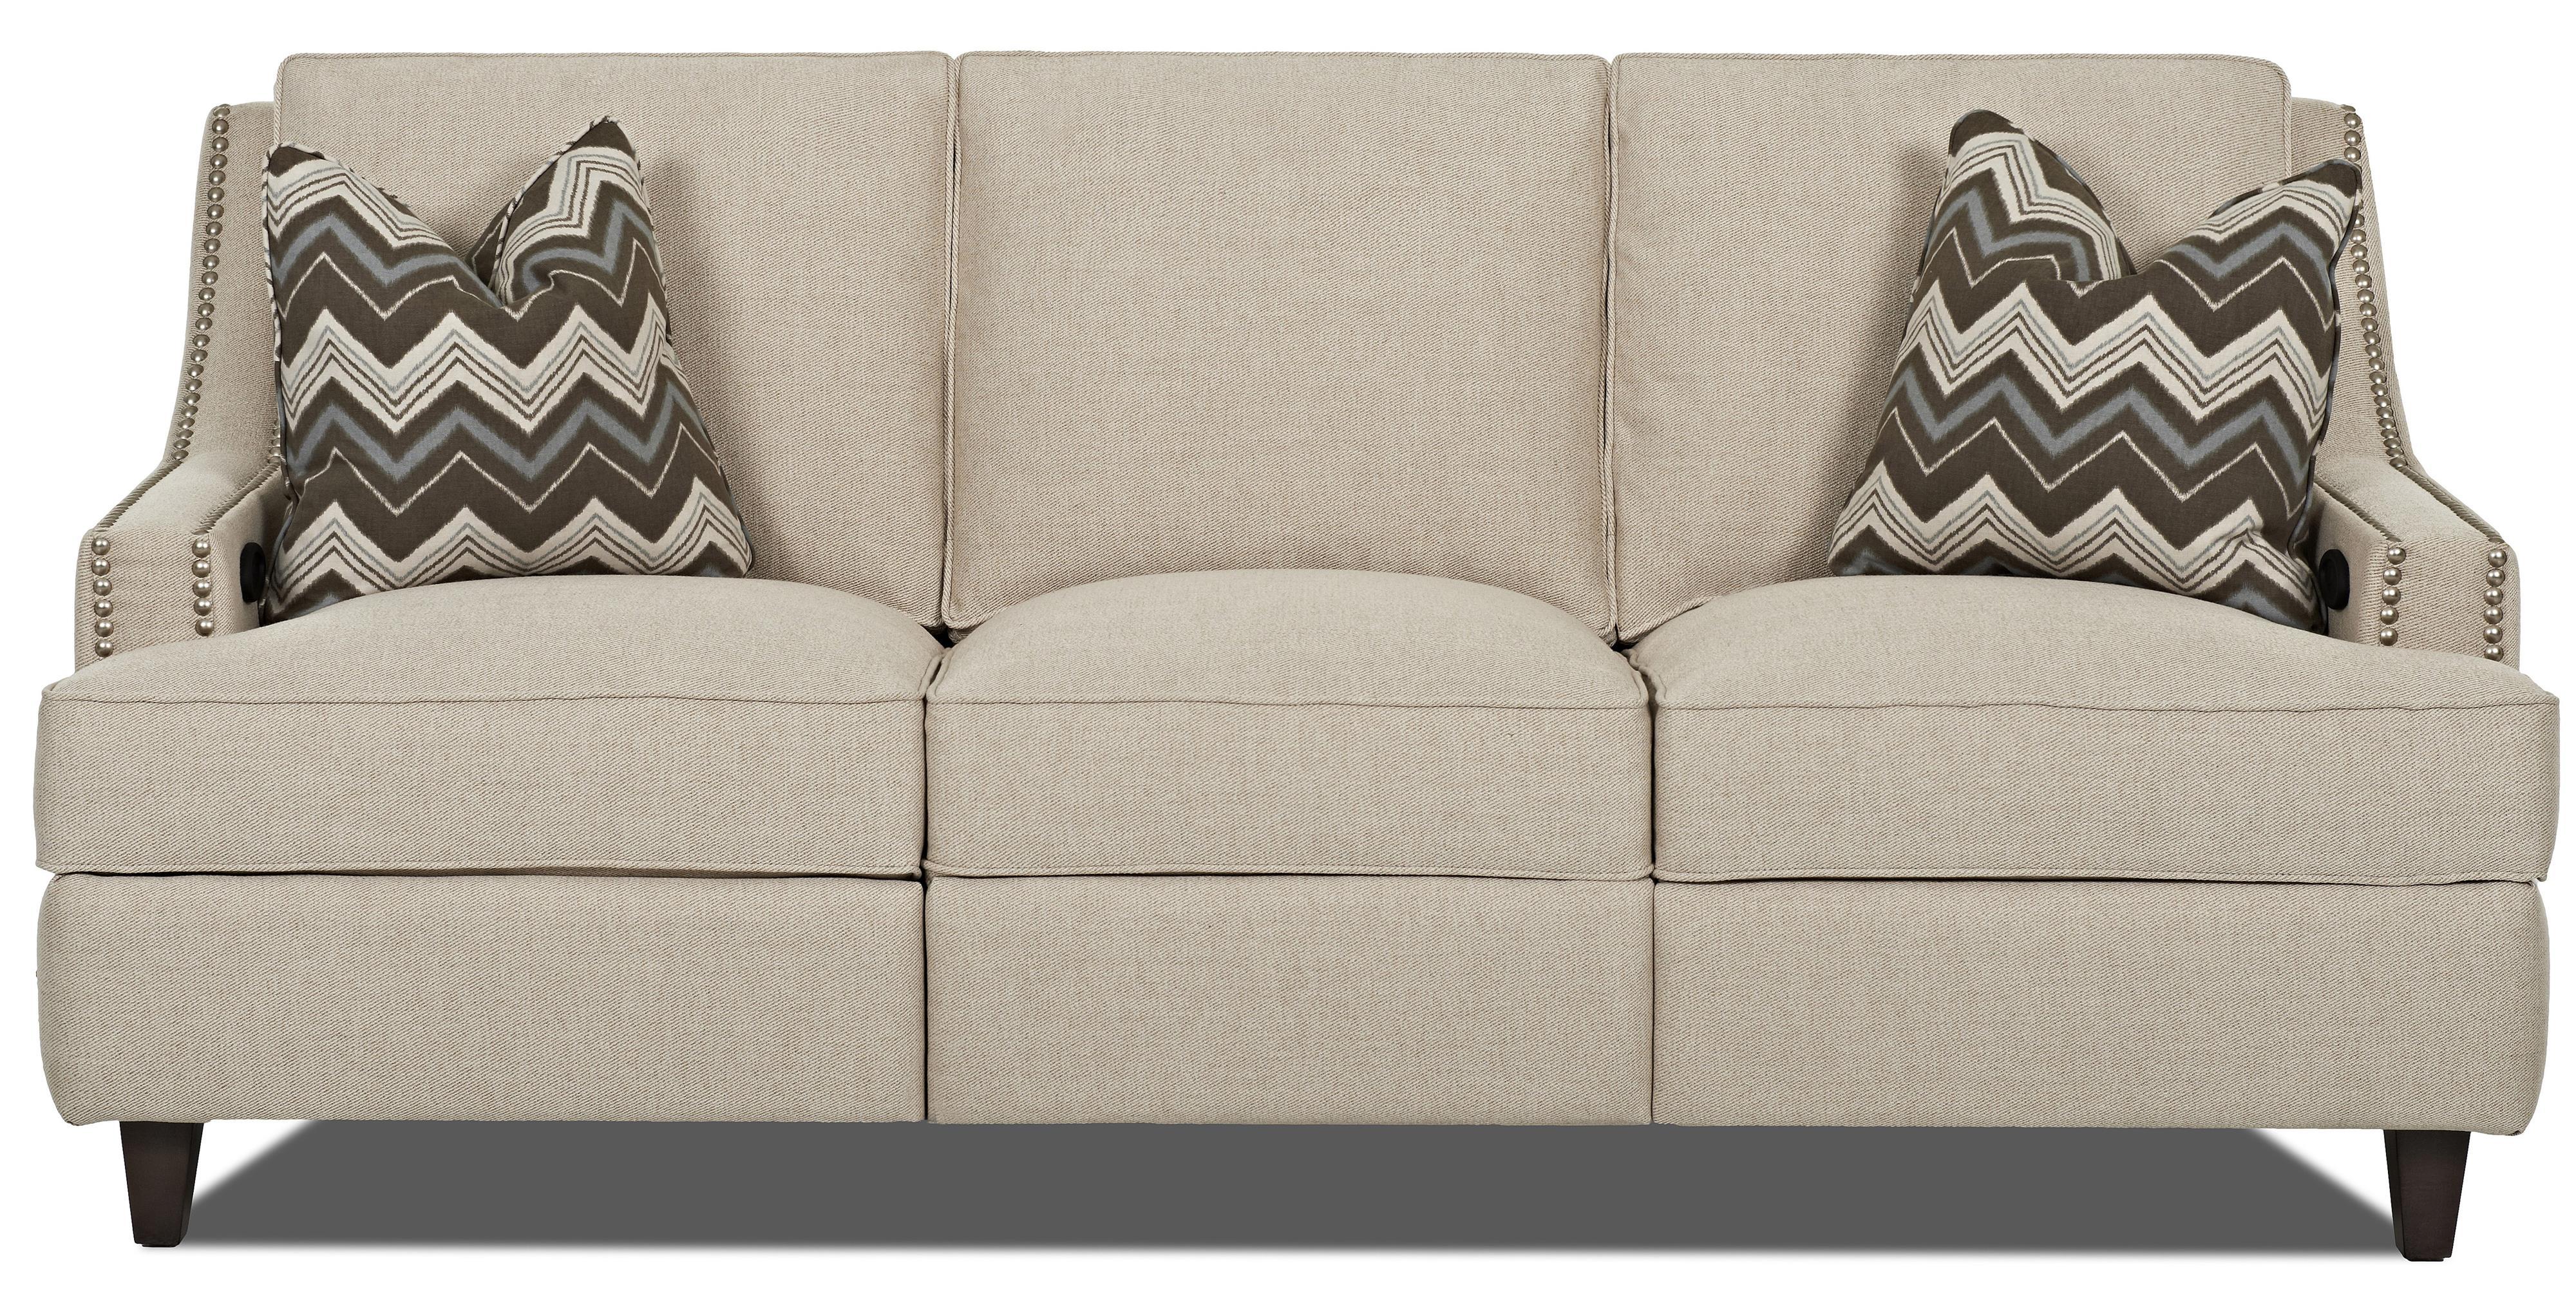 Transitional Power Hybrid Sofa